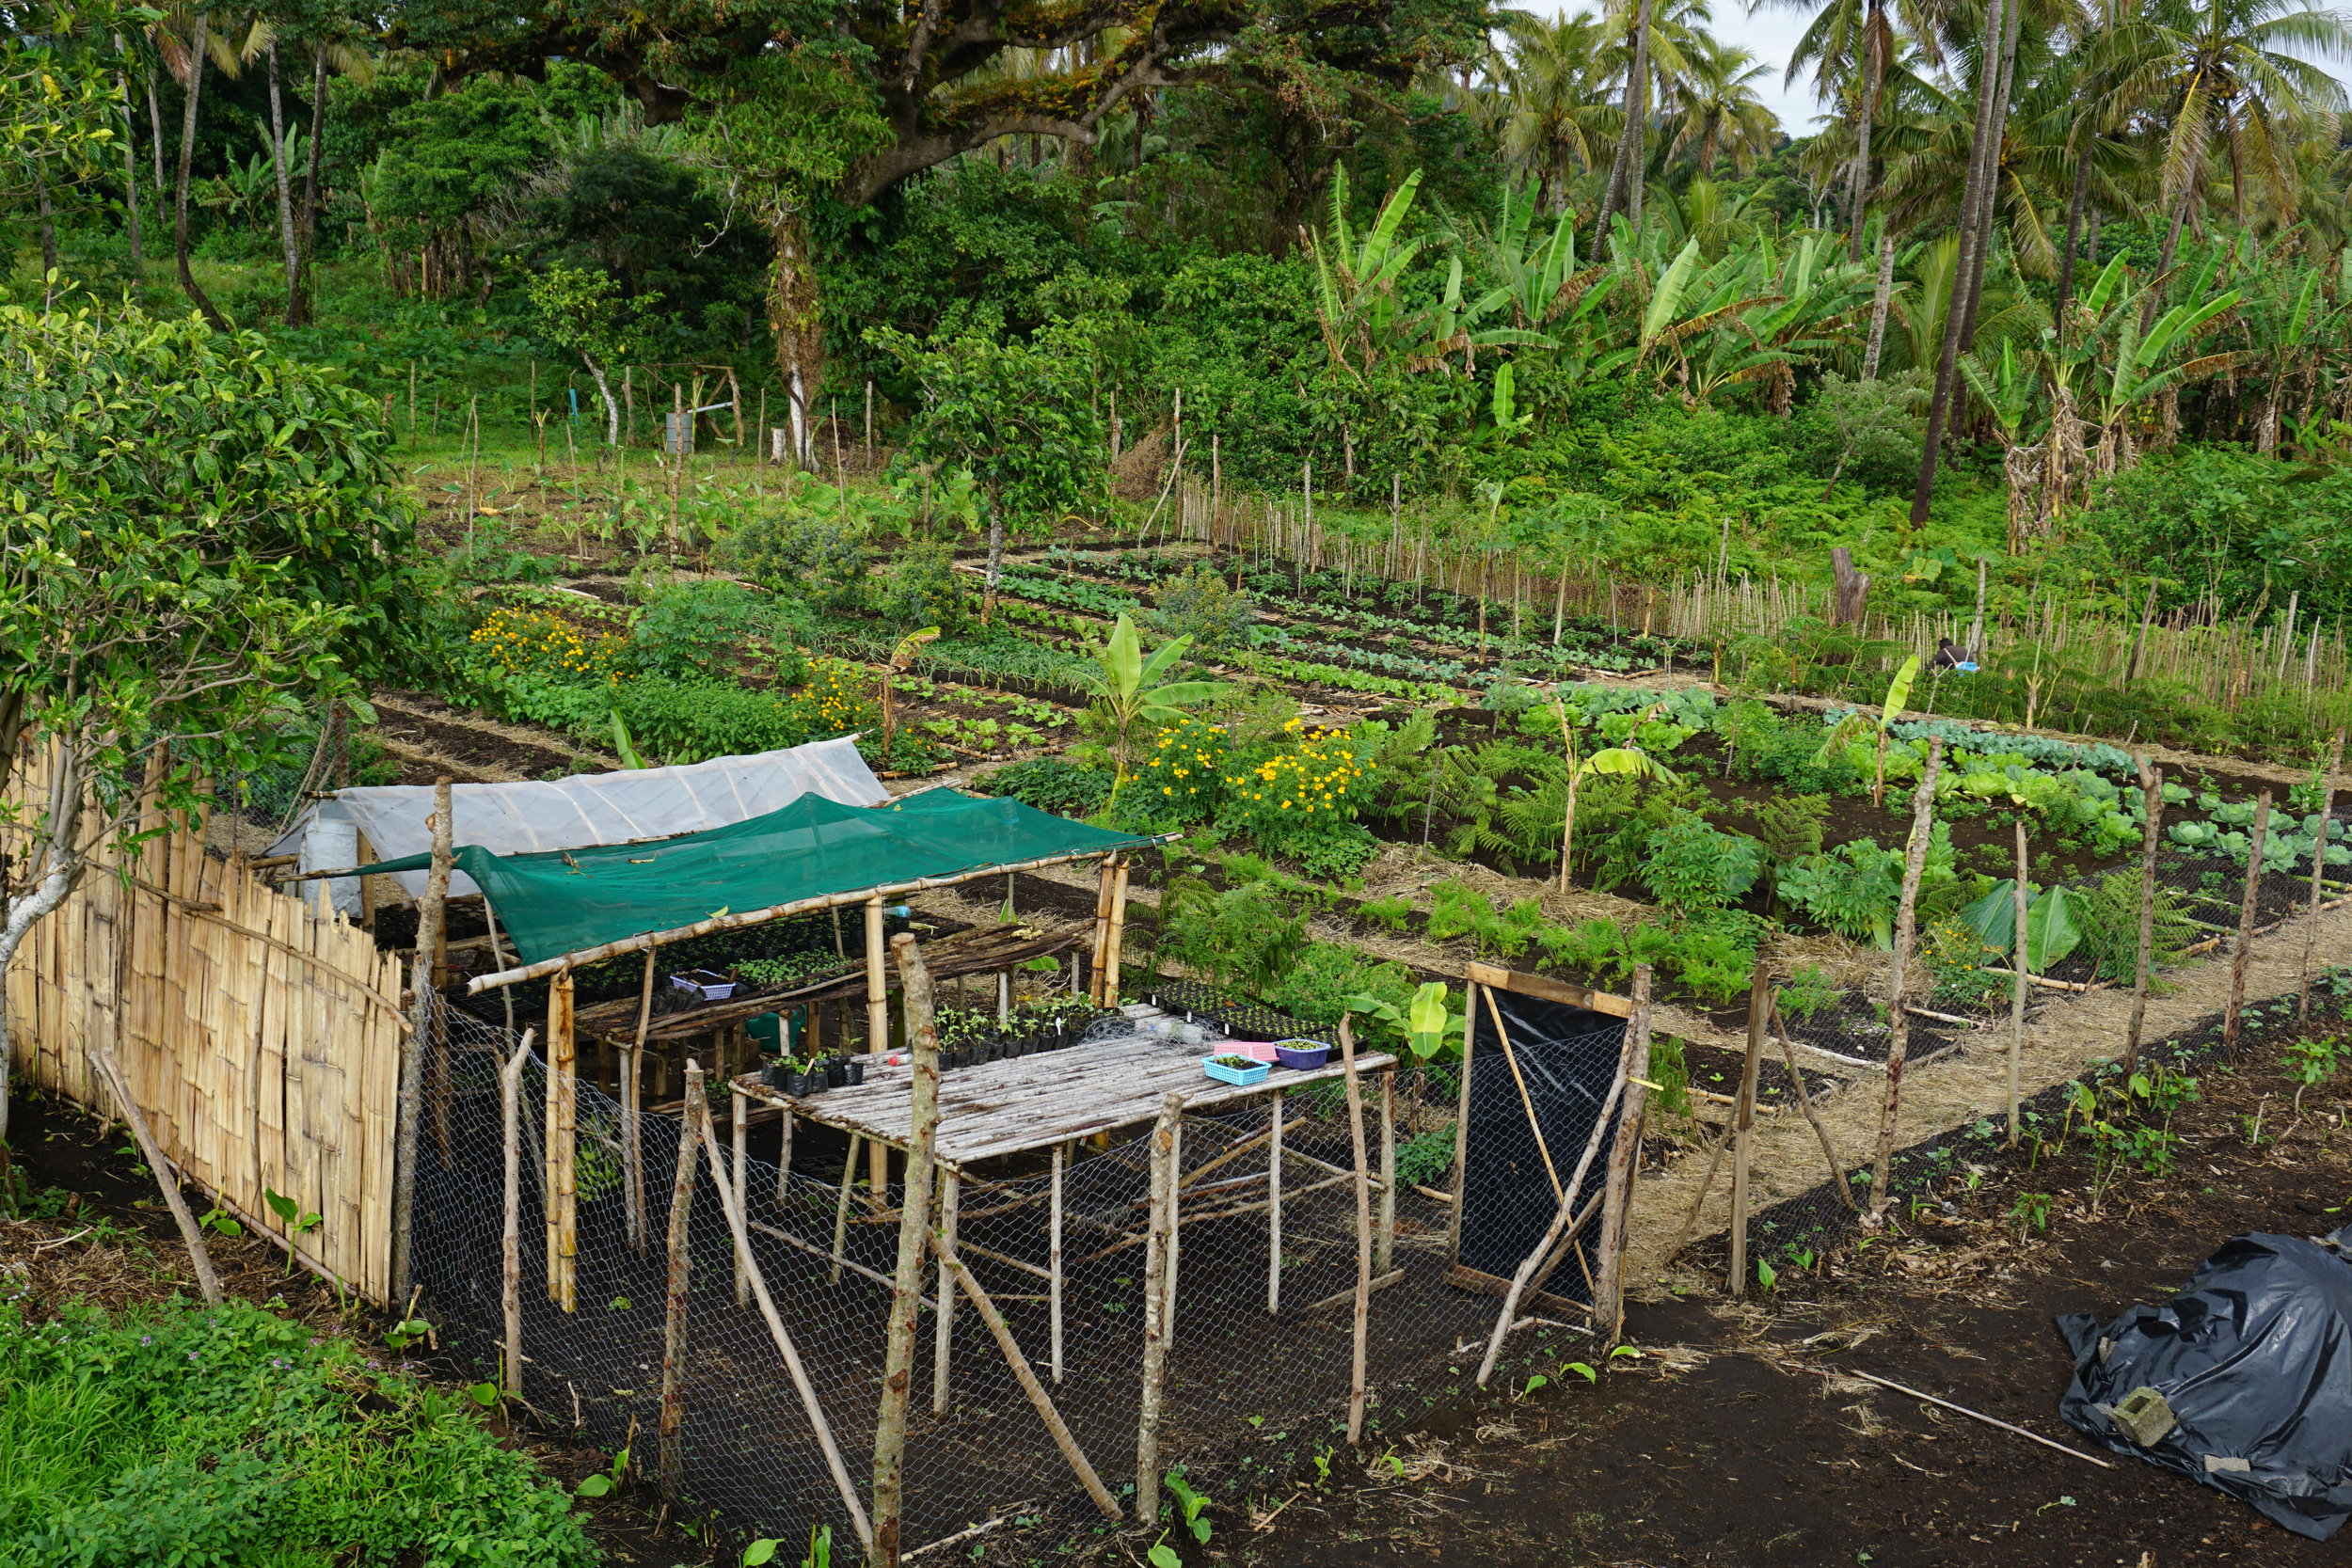 Permaculture Demonstration Site Tanna Island, Vanuatu